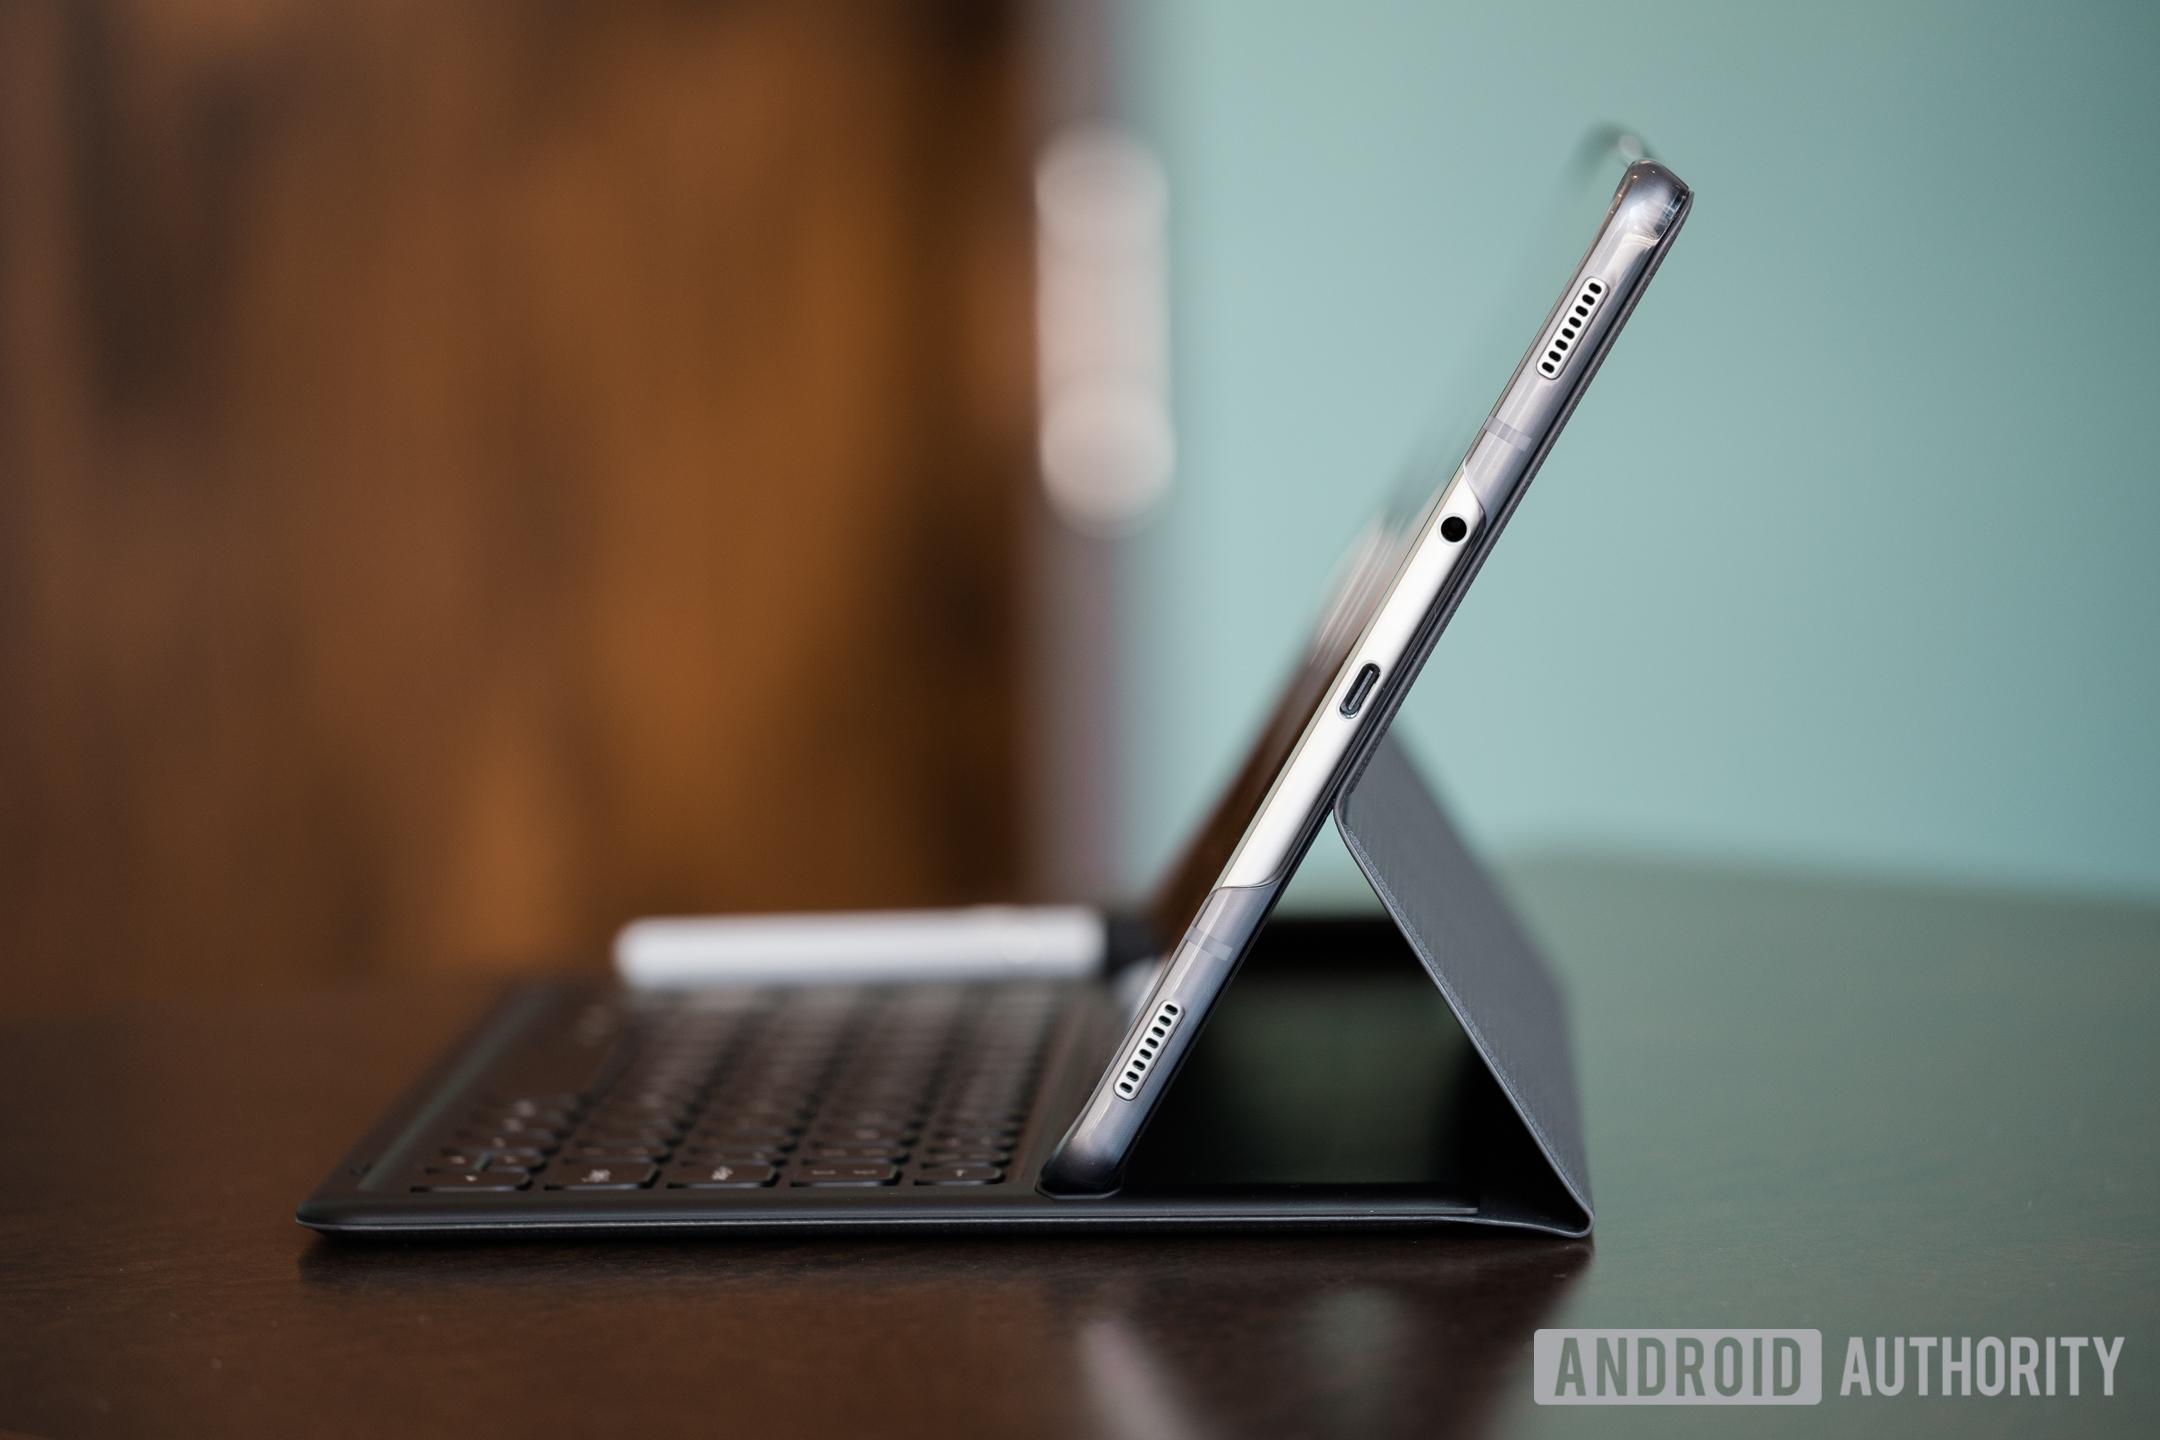 Samung Galaxy Tab S4 side view